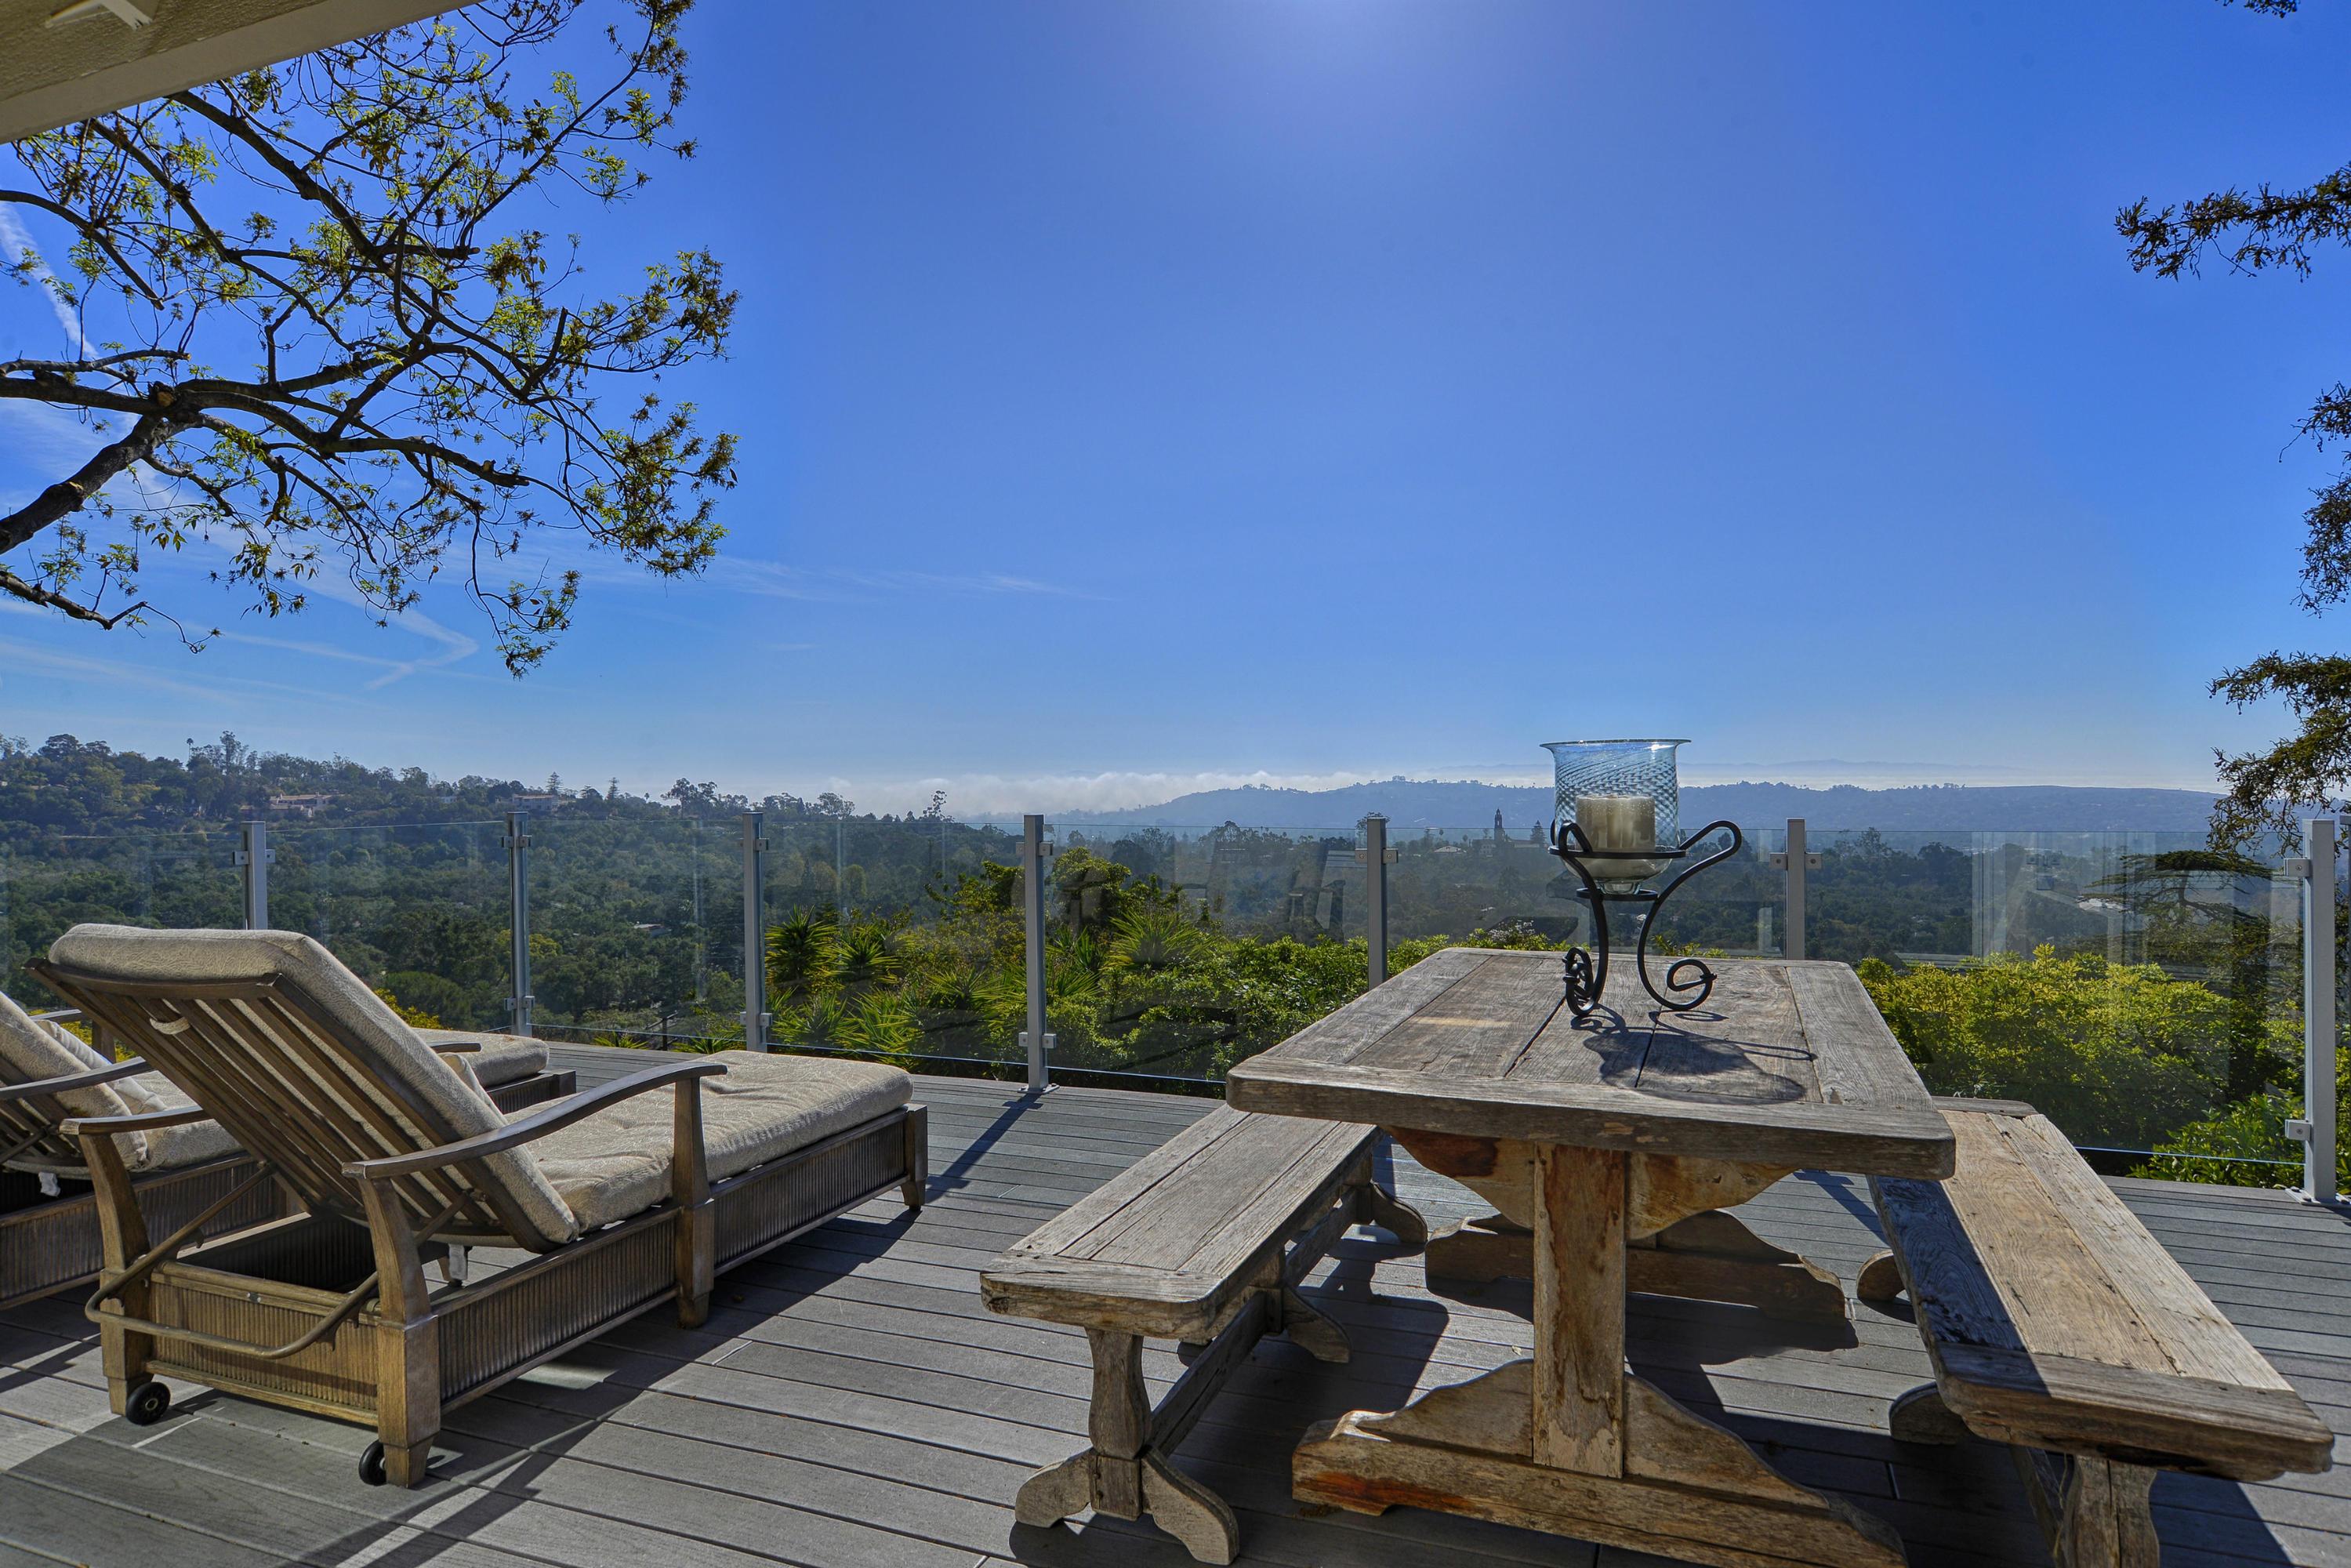 Property photo for 986 Cheltenham Rd Santa Barbara, California 93105 - 14-329